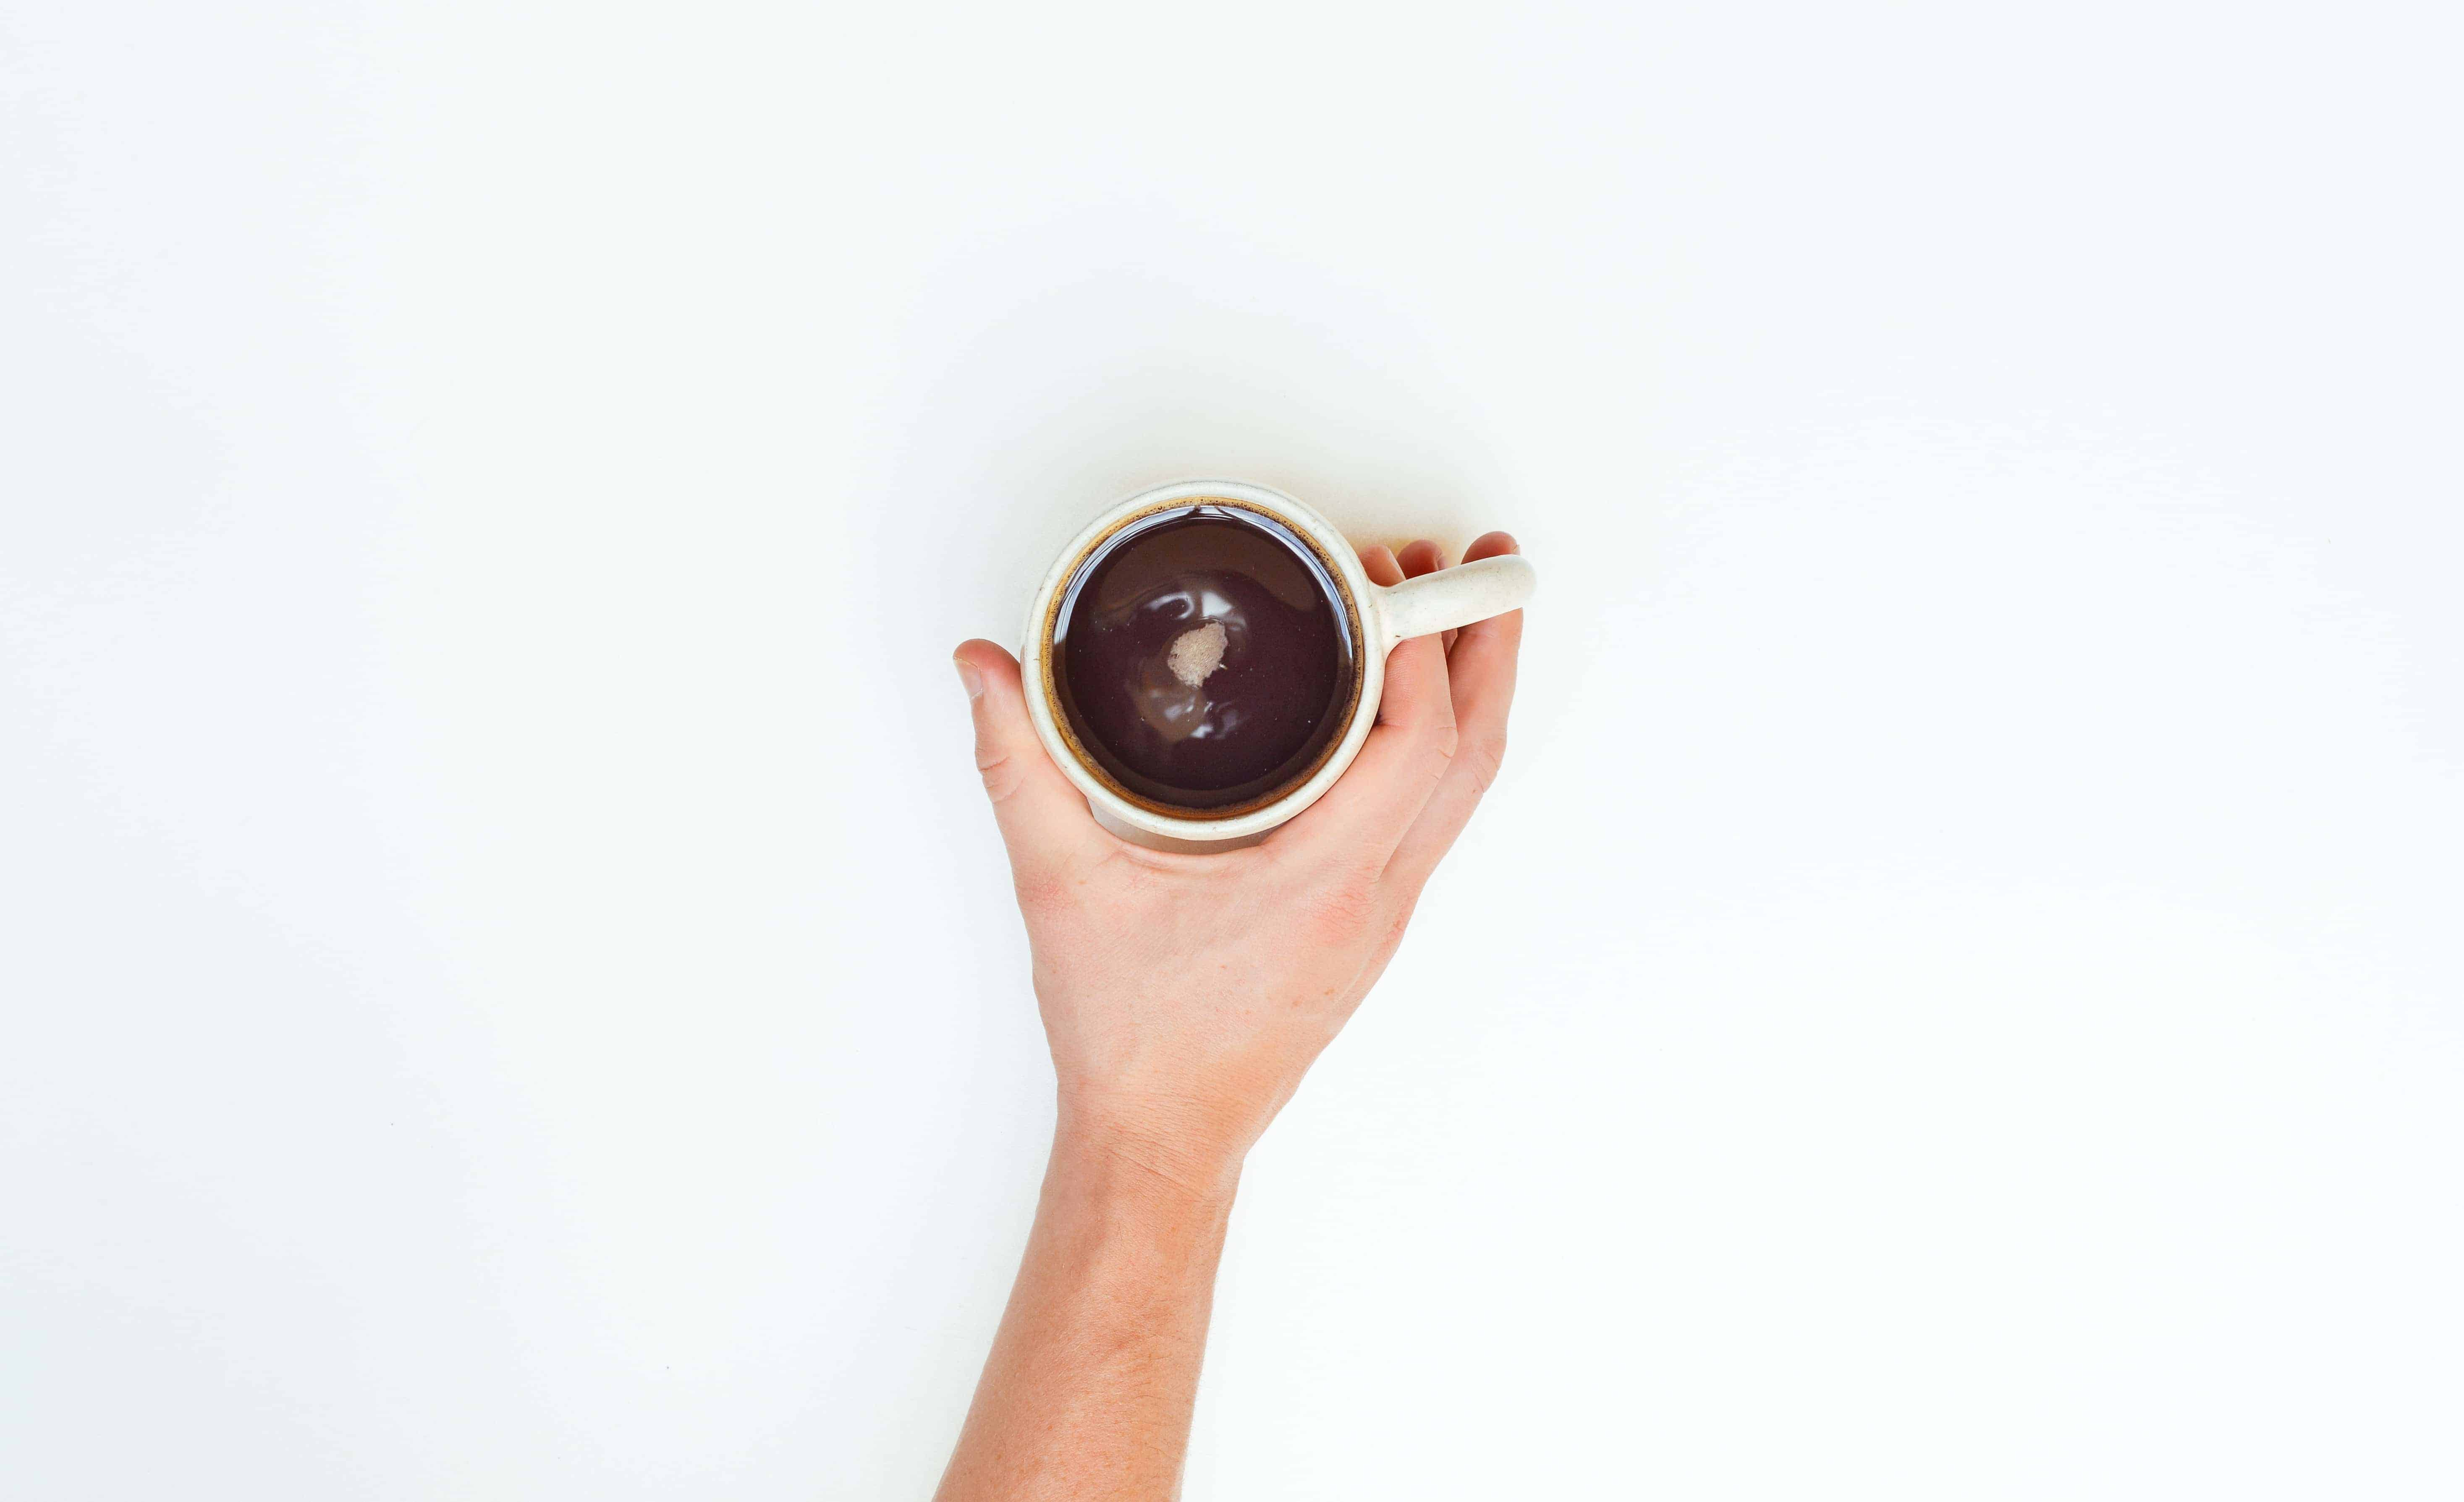 coffee-cup-hand-mug_stokpic